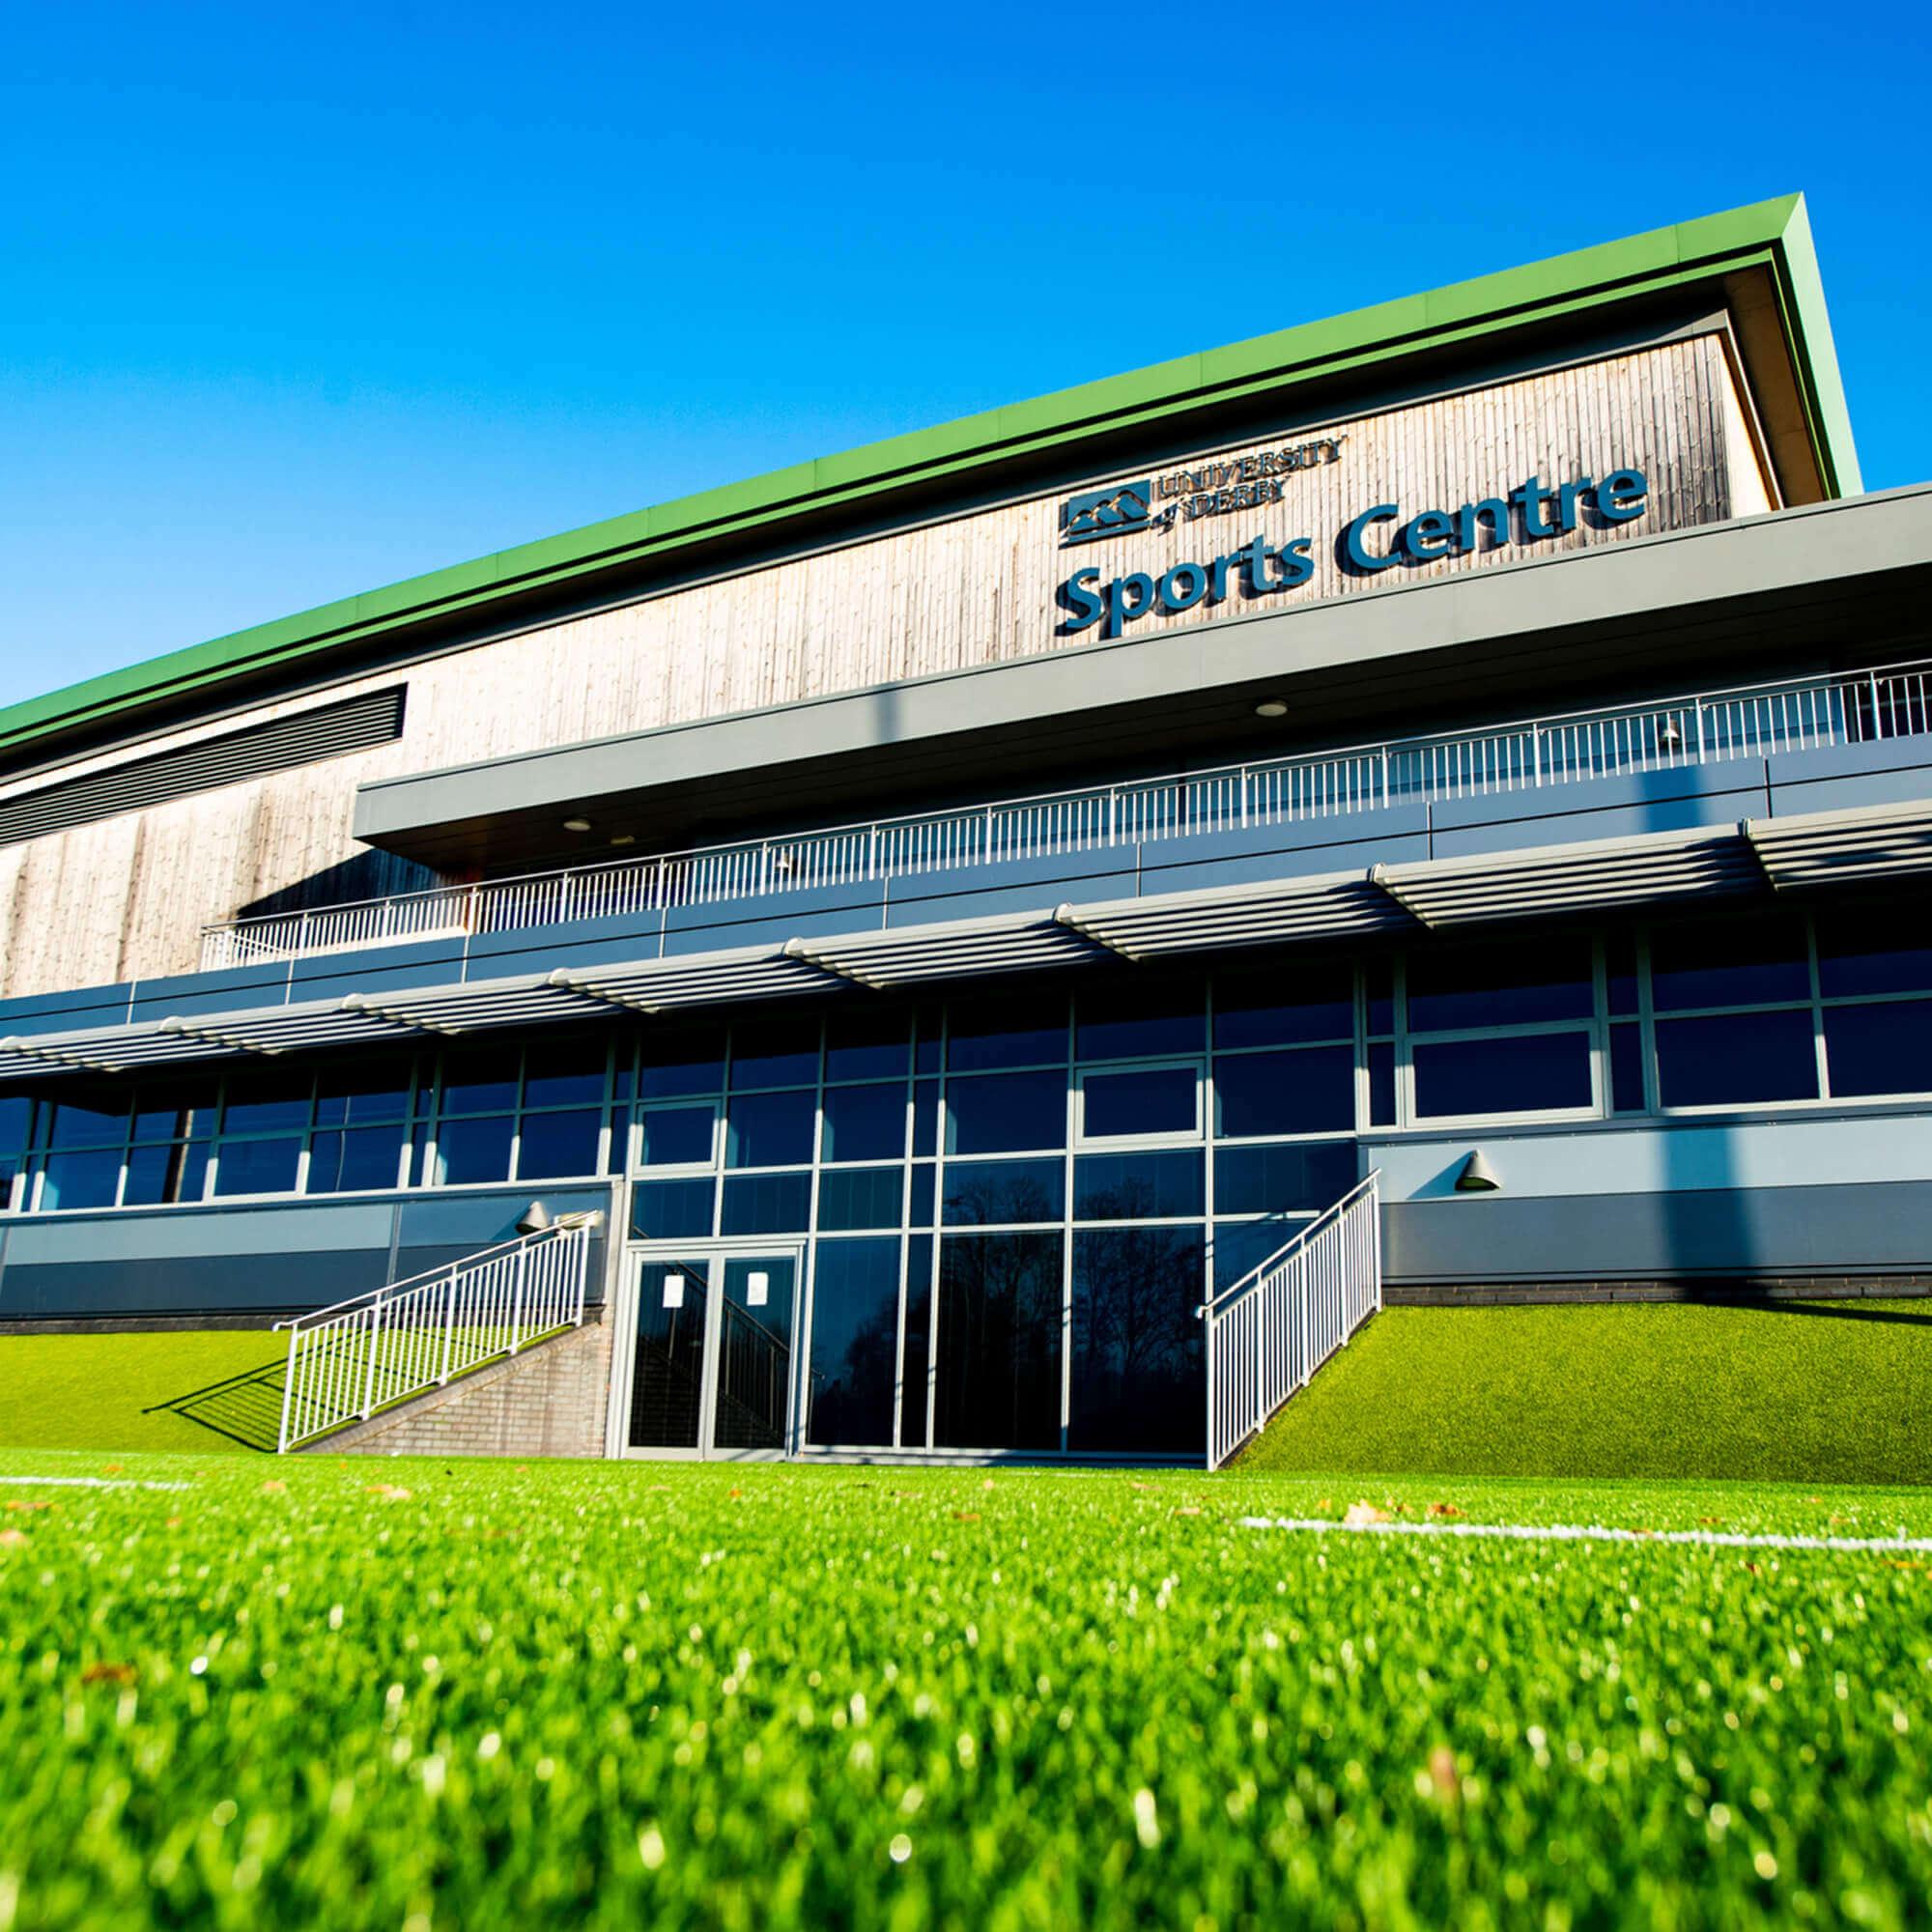 The University's sport centre on a sunny day.